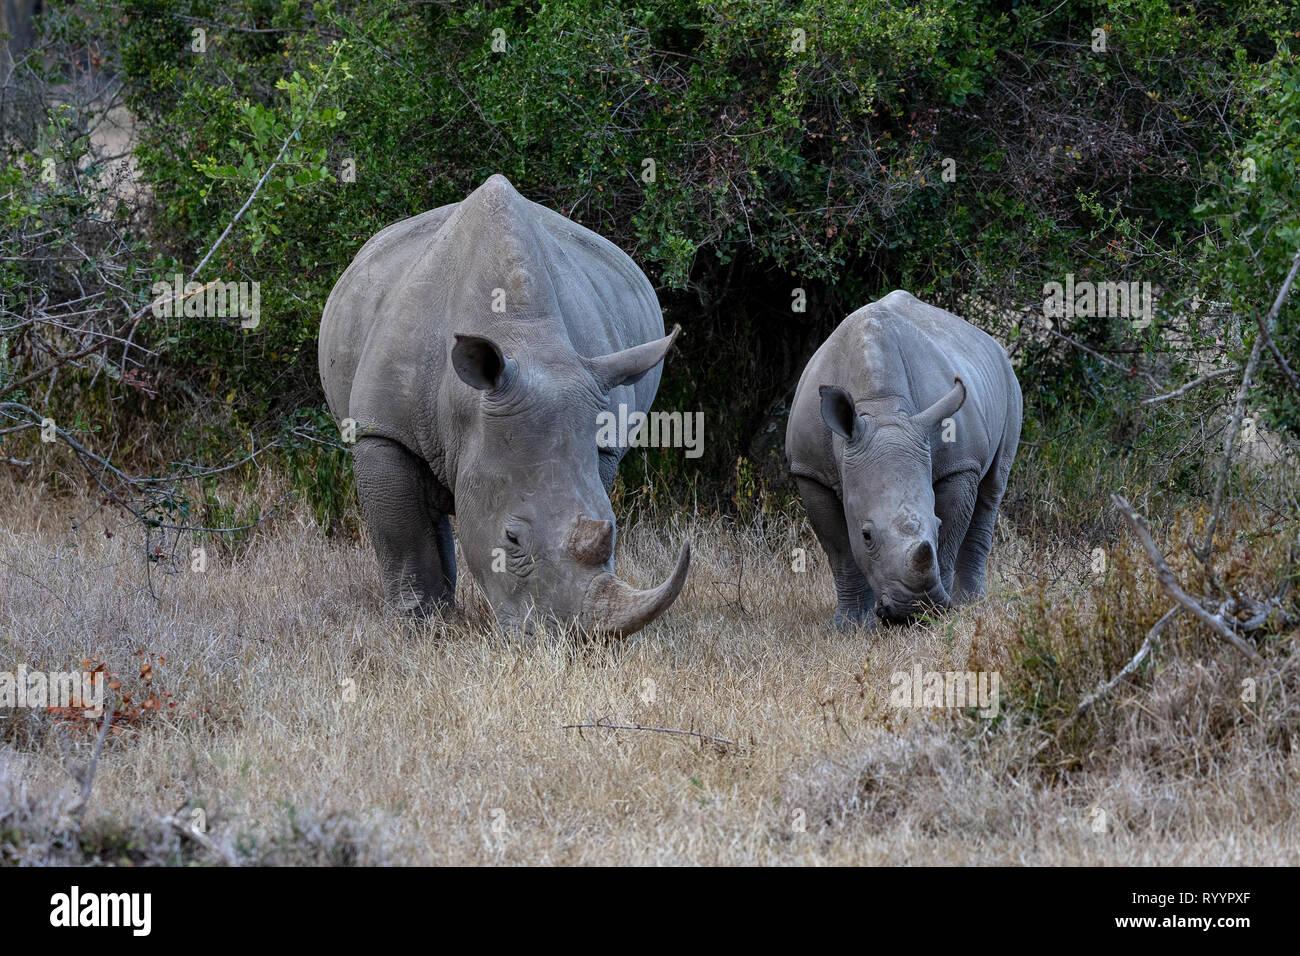 Endangered White Rhinoceros, Kenya, Africa - Stock Image